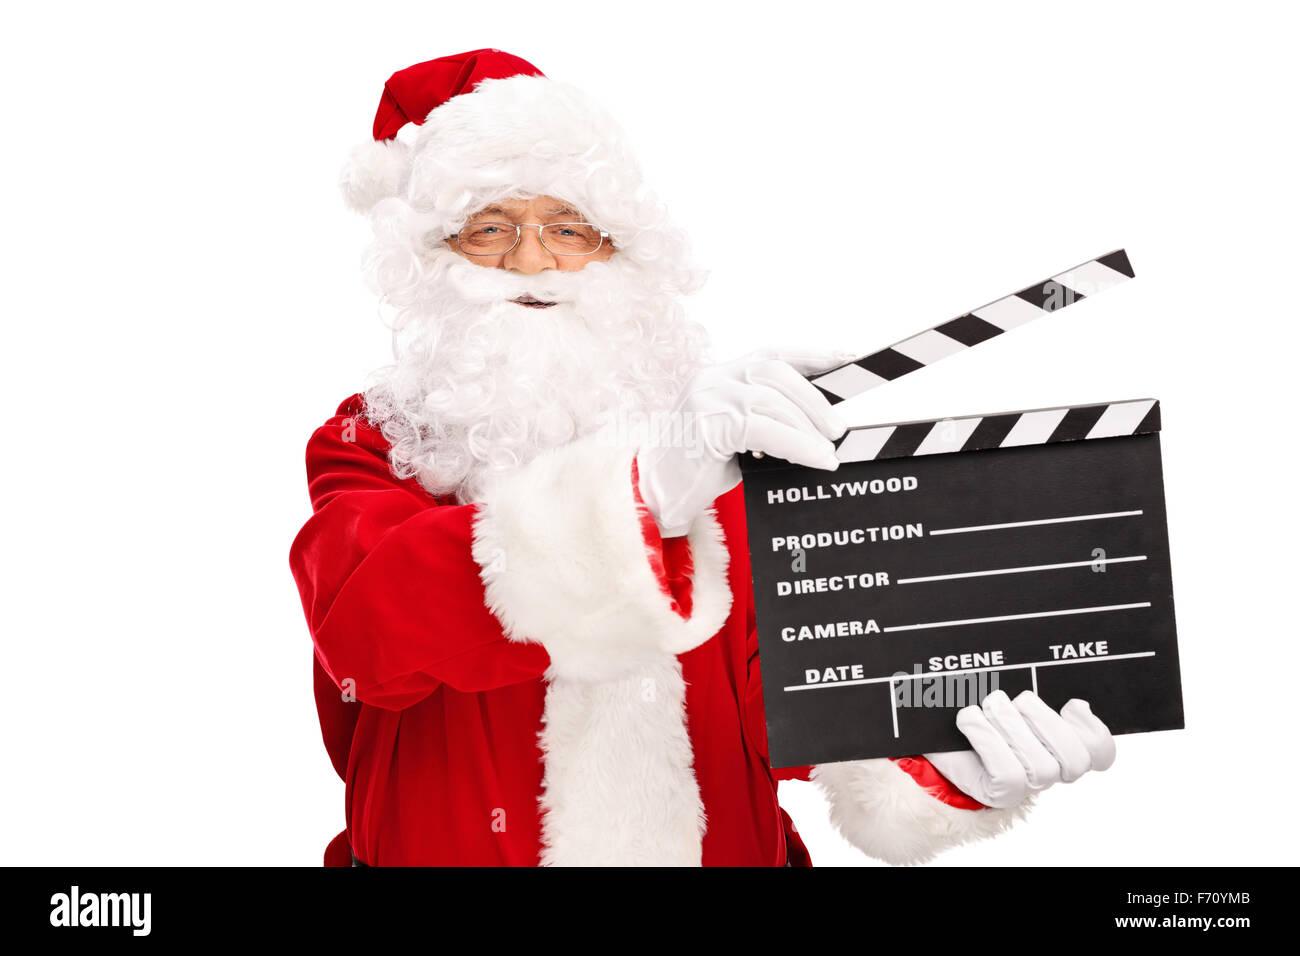 Cinema Santa Claus Stock Photos & Cinema Santa Claus Stock Images ...